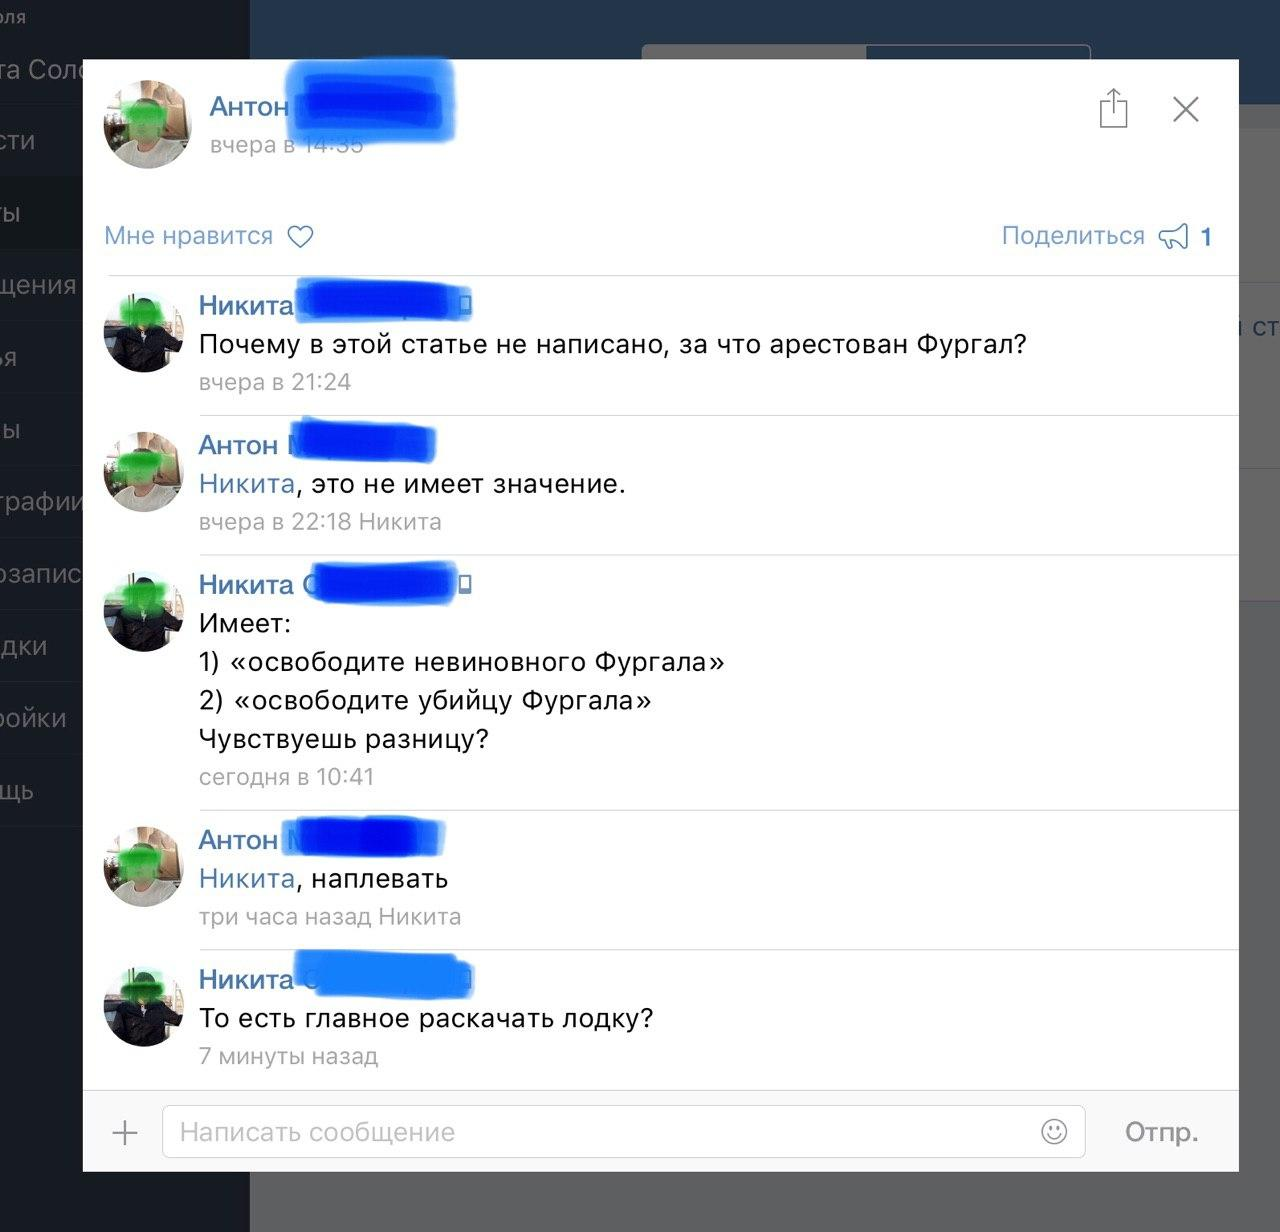 https://forumupload.ru/uploads/0000/14/1c/22142/654080.jpg